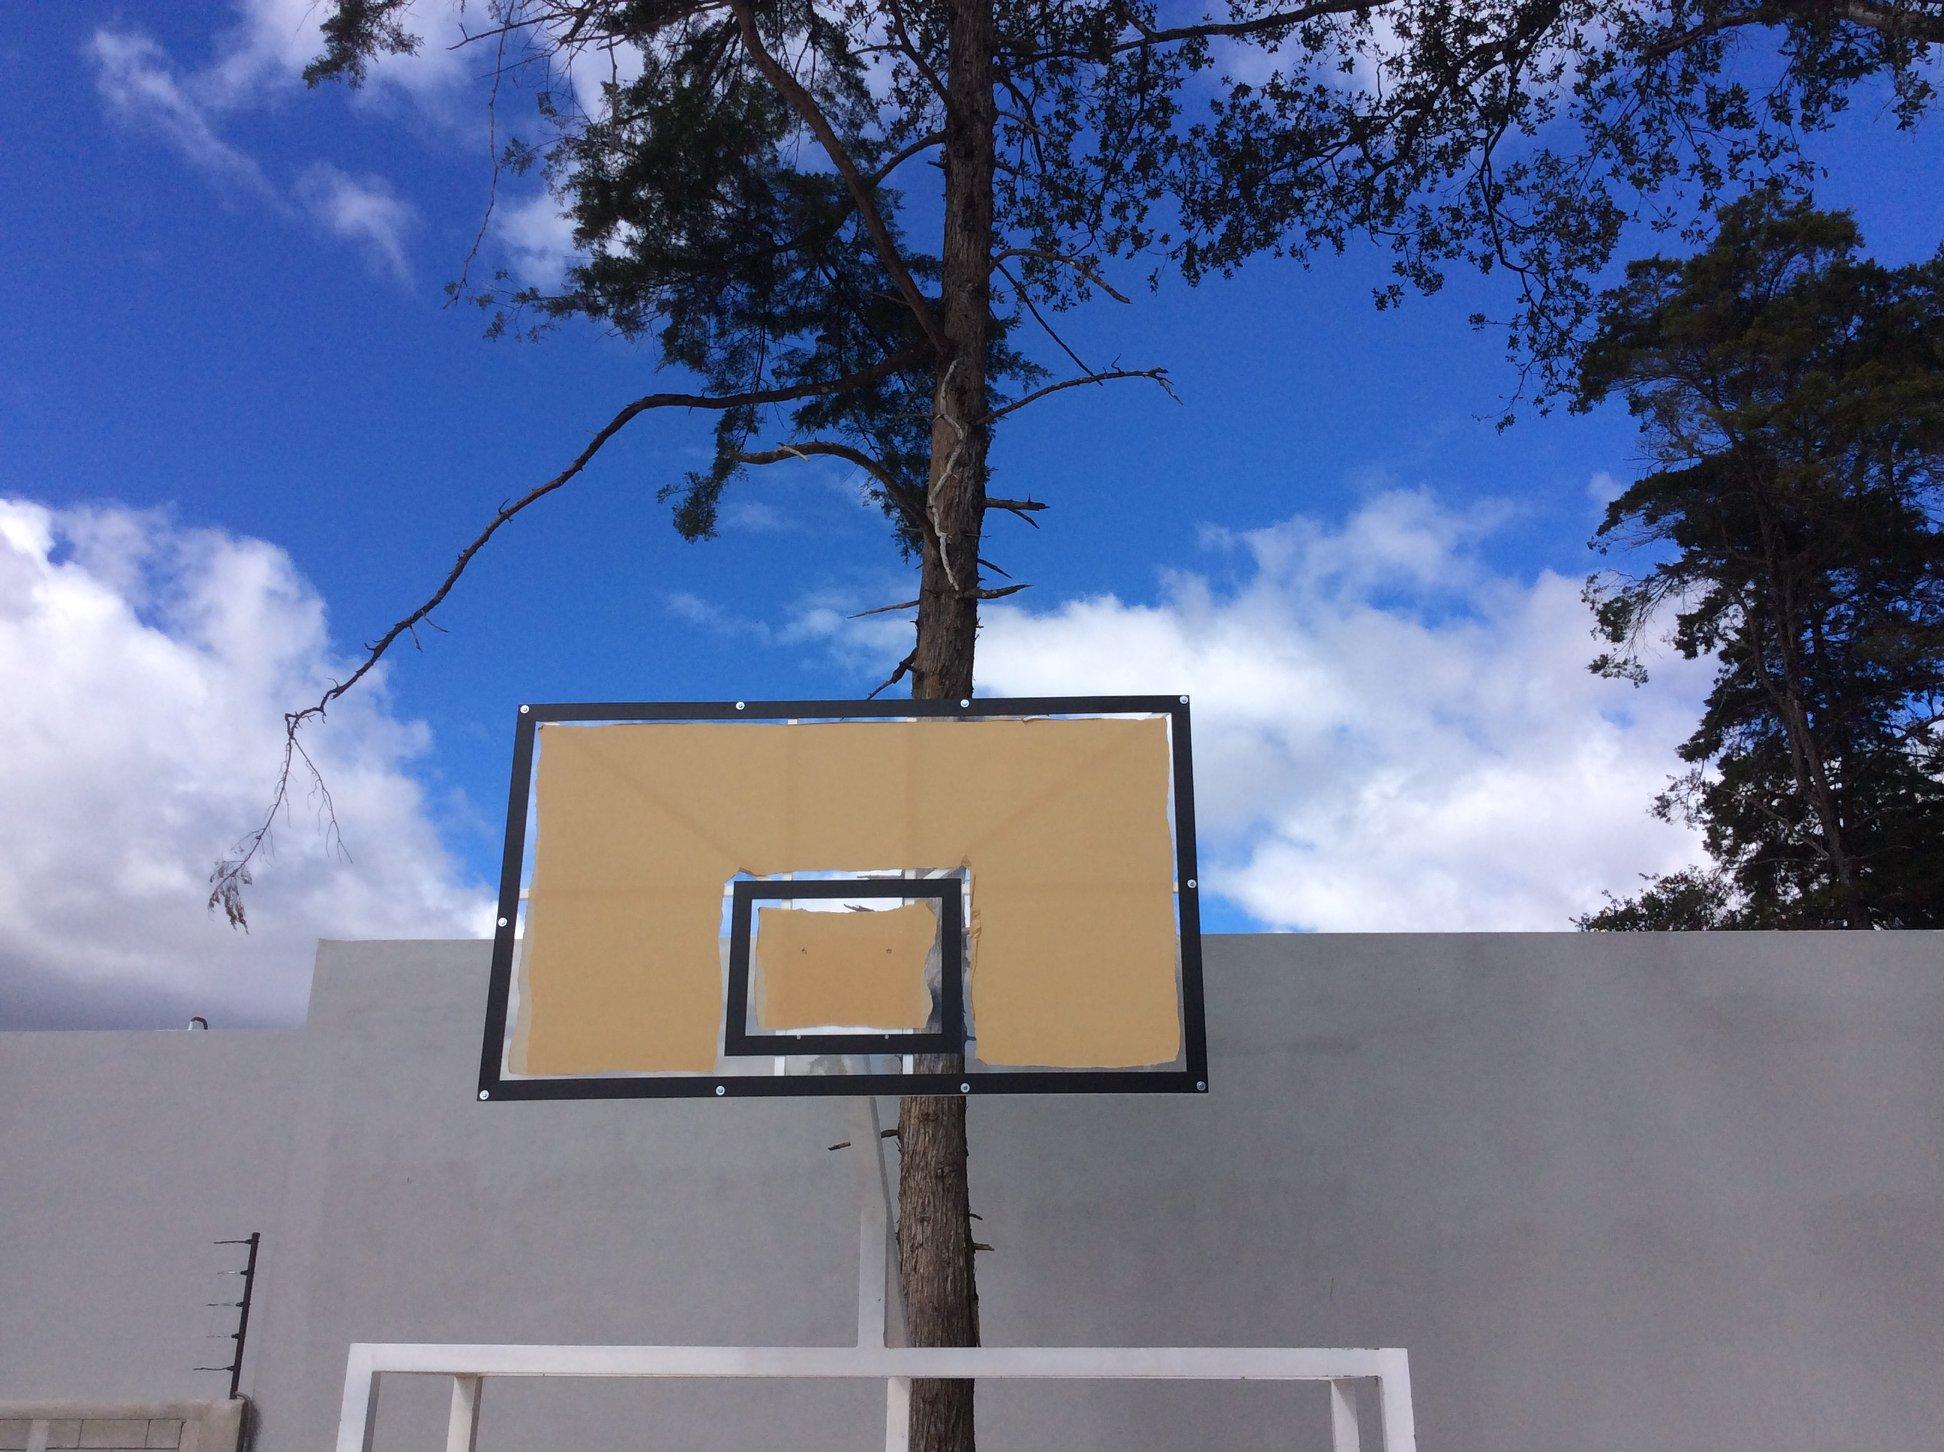 tablero basketball acrilico guatemala